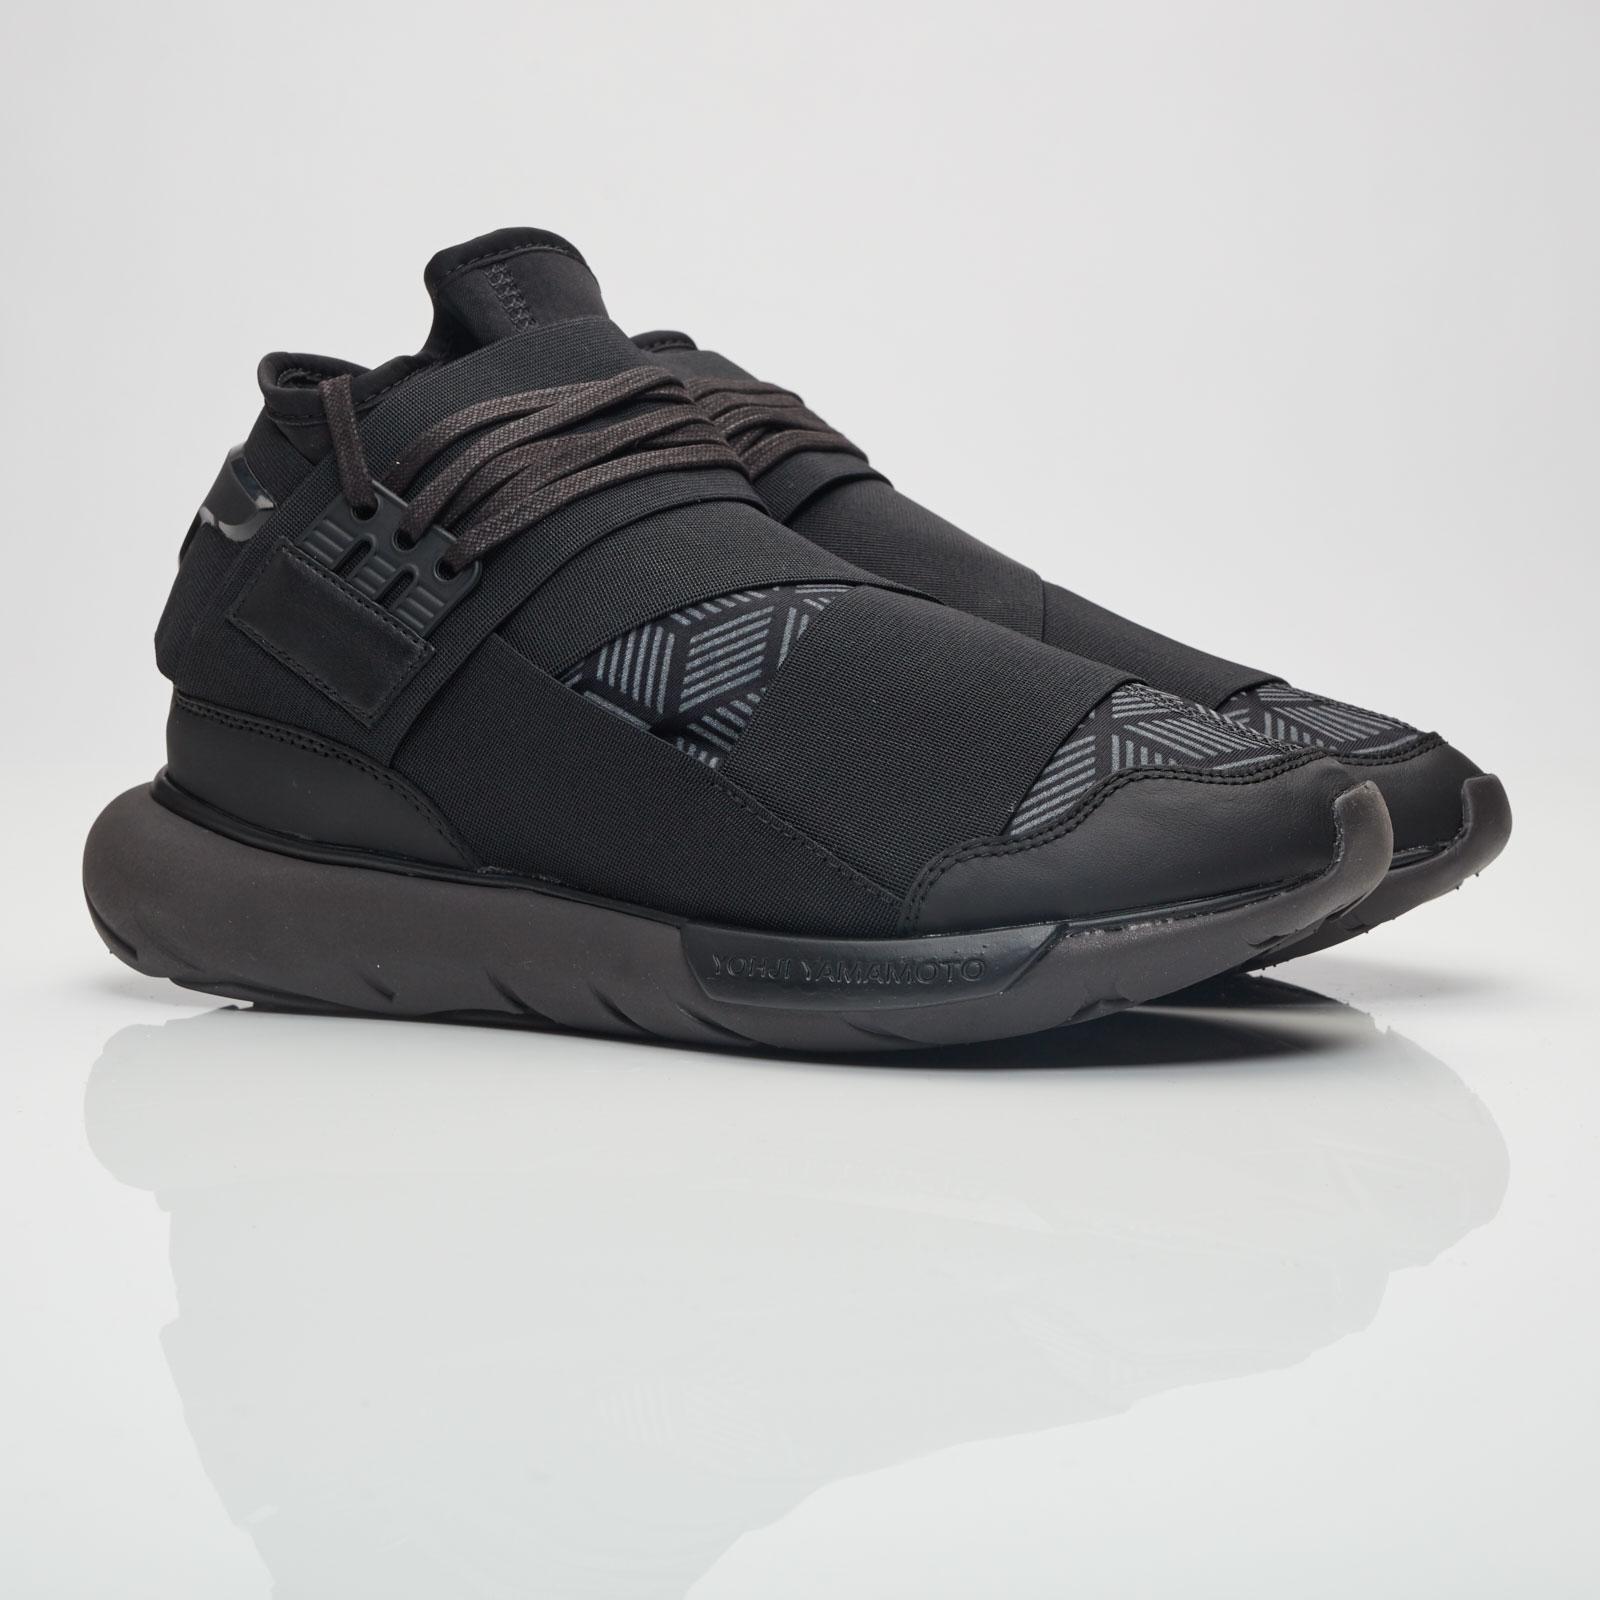 a7fce7781 adidas Qasa High - S82123 - Sneakersnstuff